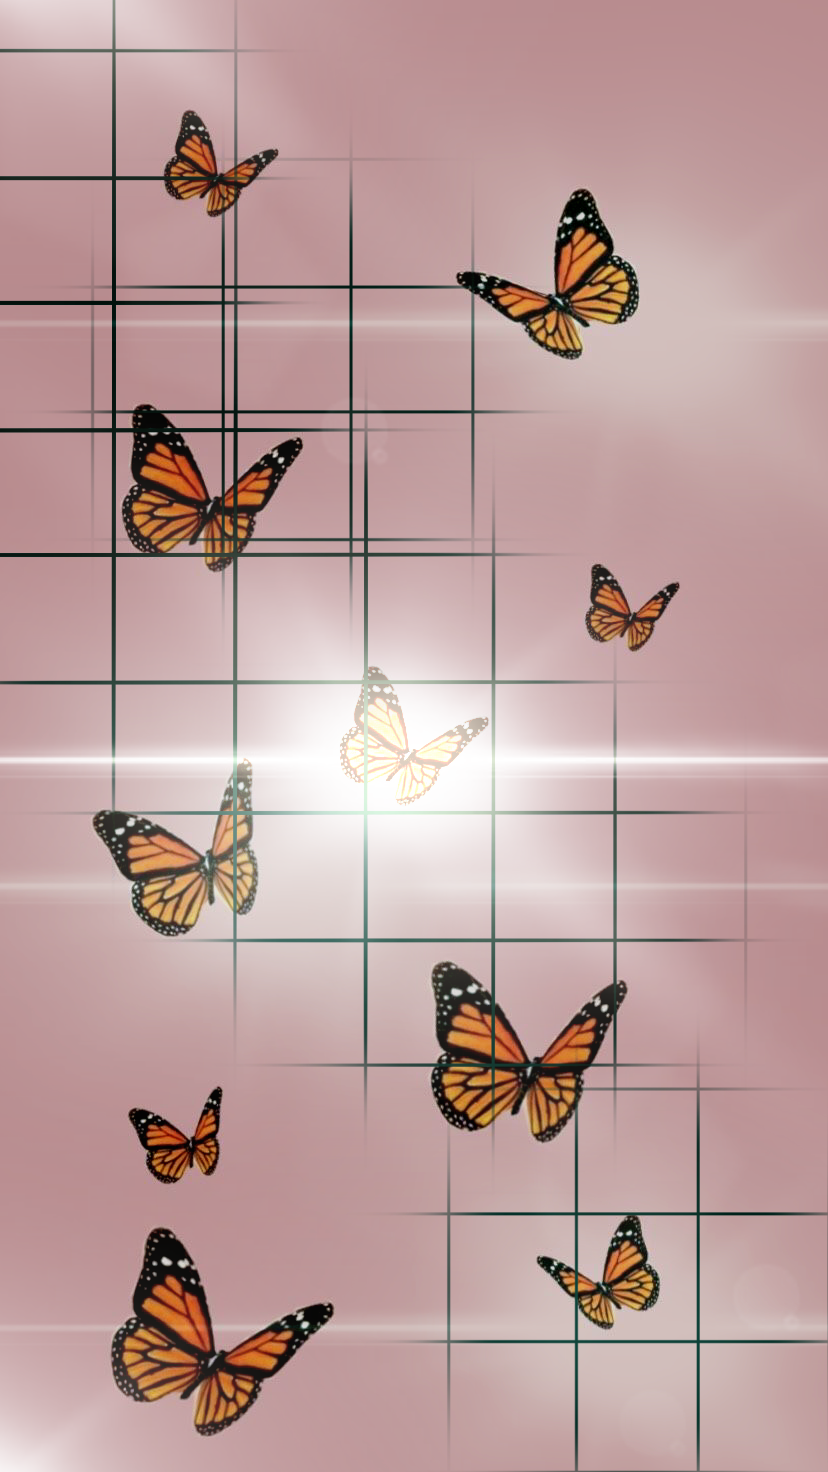 Butterfly Wallpaper Butterfly Wallpaper Butterfly Wallpaper Iphone Aesthetic Iphone Wallpaper